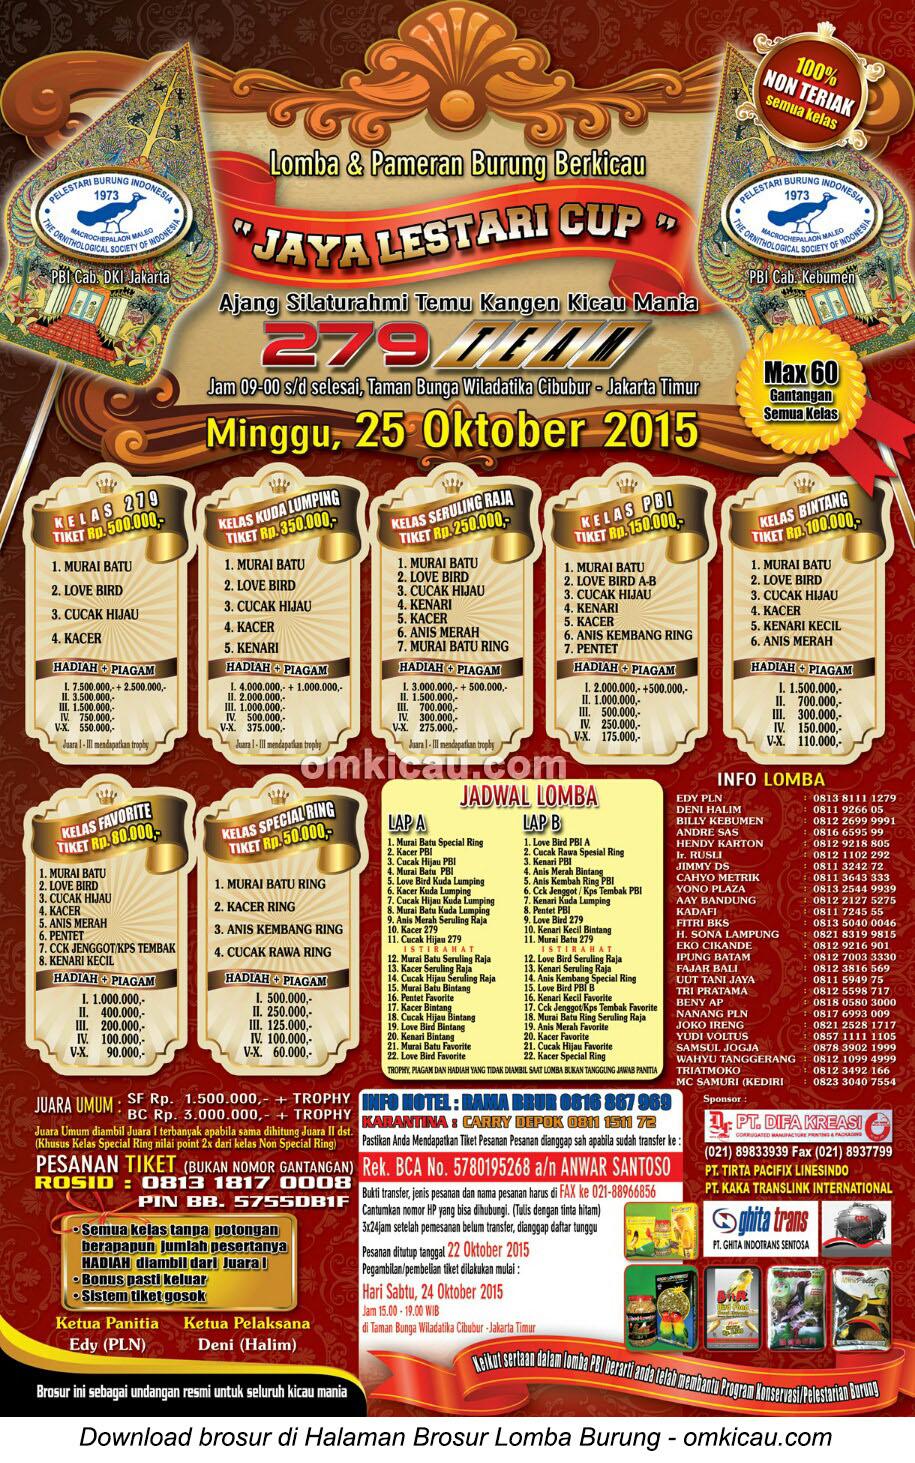 Brosur revisi Lomba Burung Berkicau Jaya Lestari Cup, Jakarta, 25 Oktober 2015